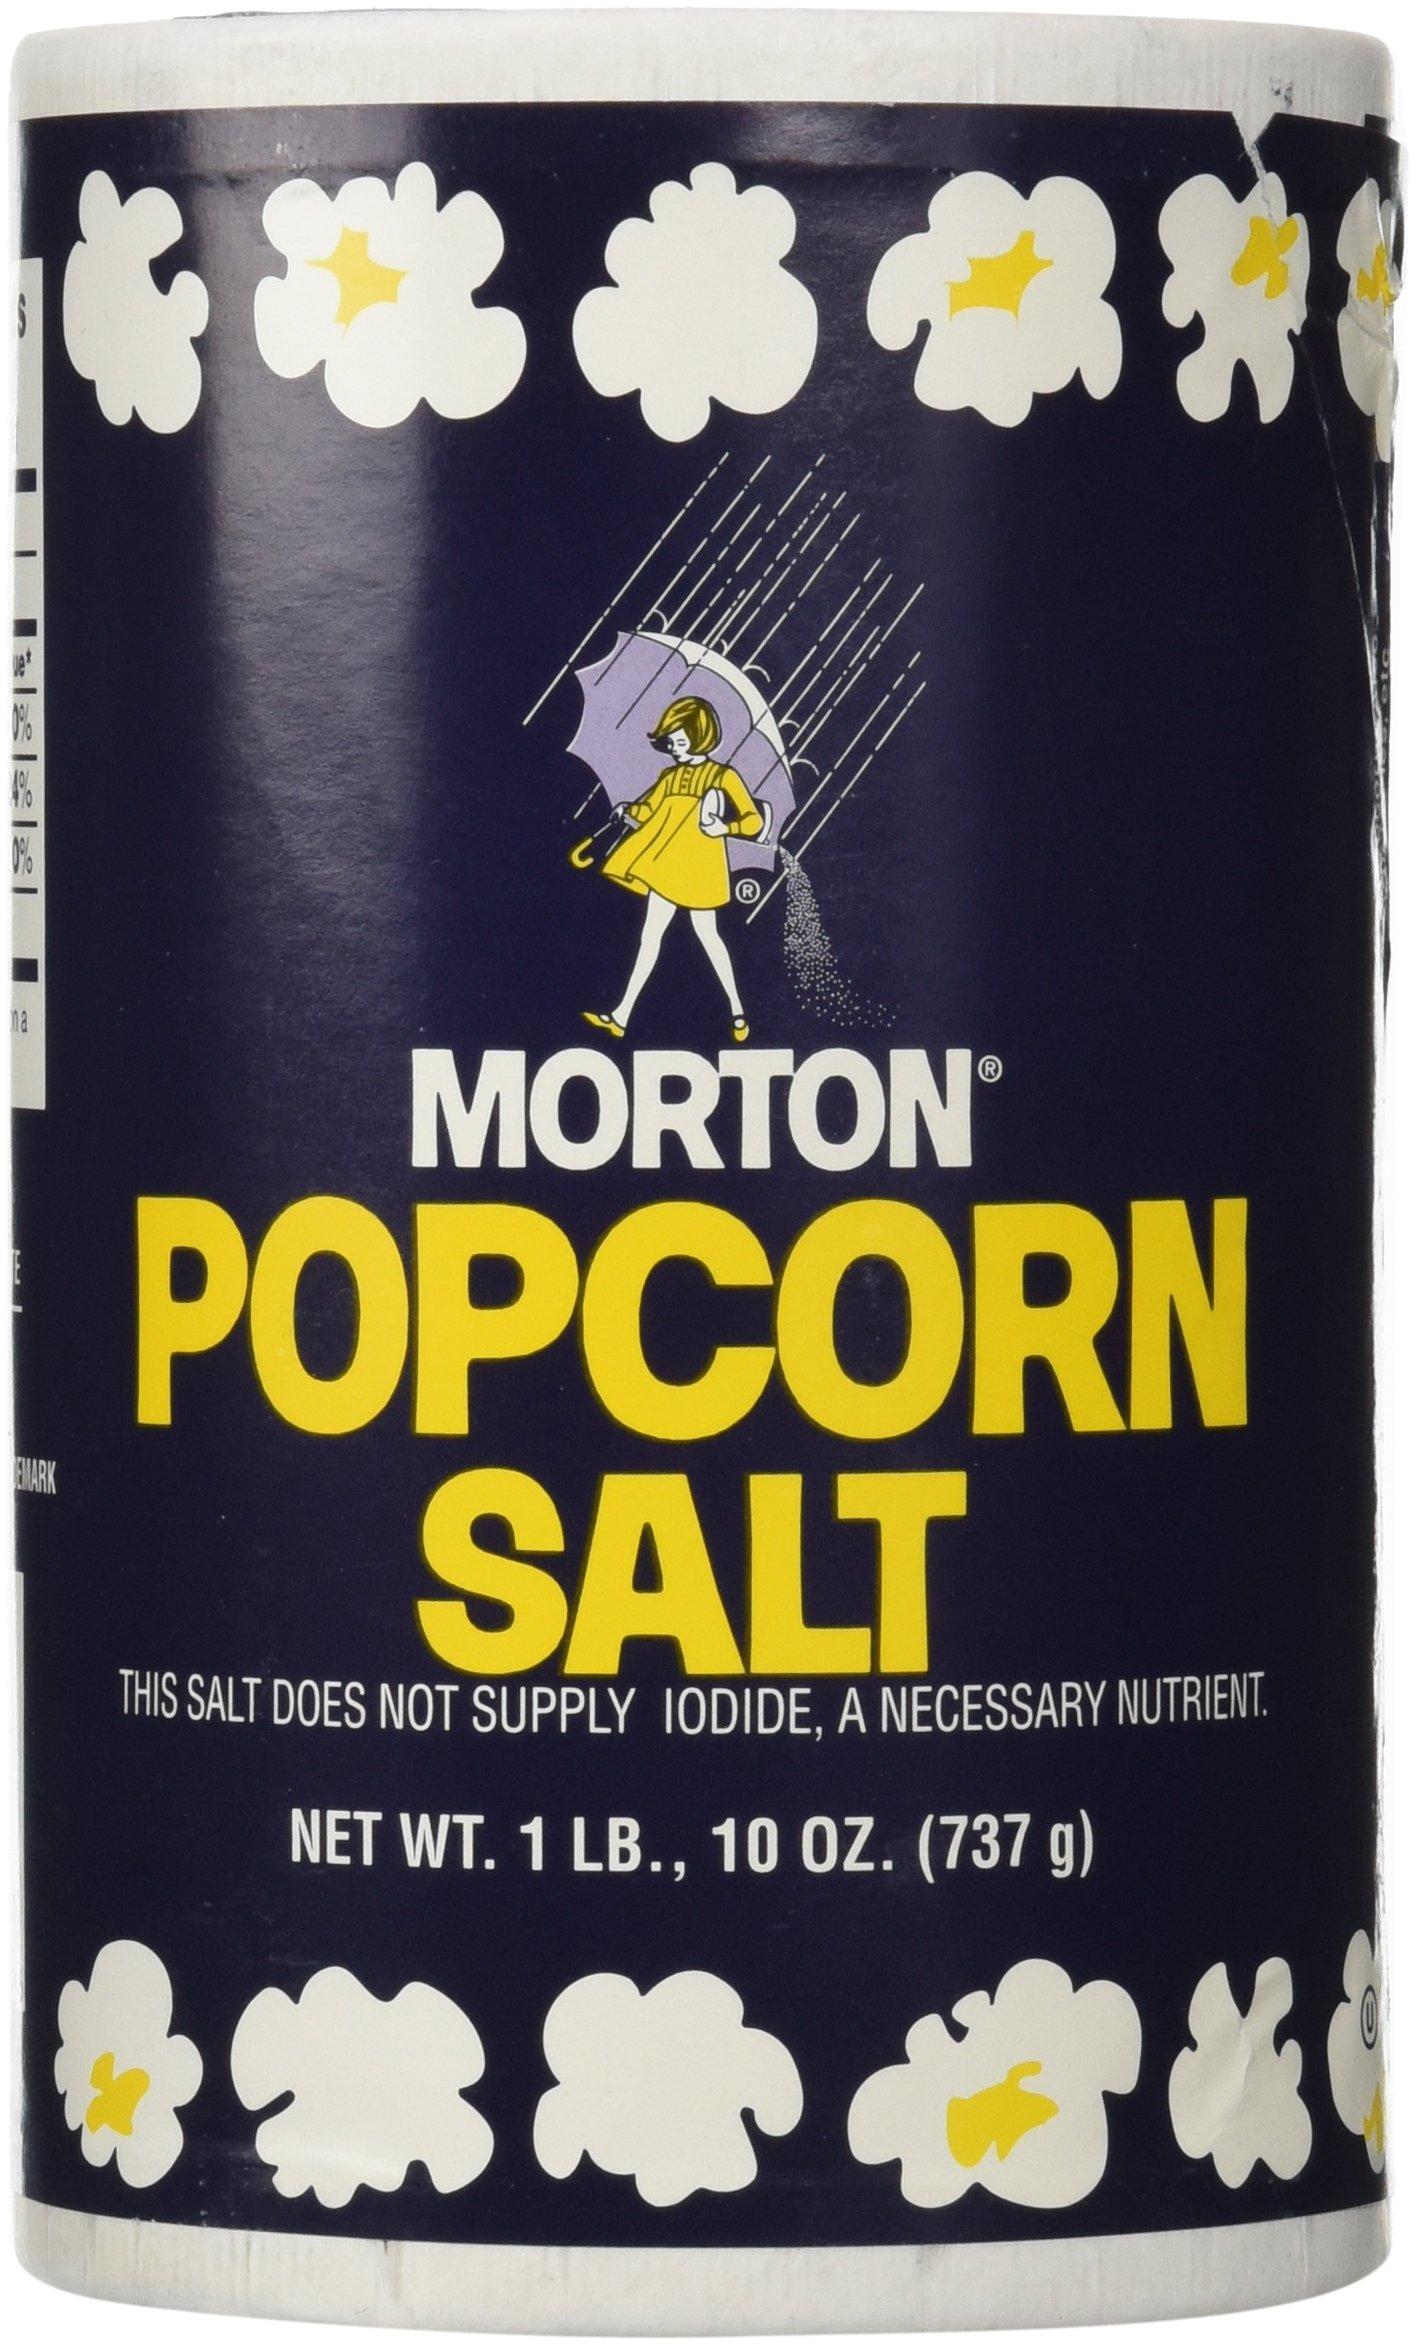 1Lb 10oz Morton Popcorn Salt For Green Salad, Corn on the Cob, French Fries, Nuts by Morton